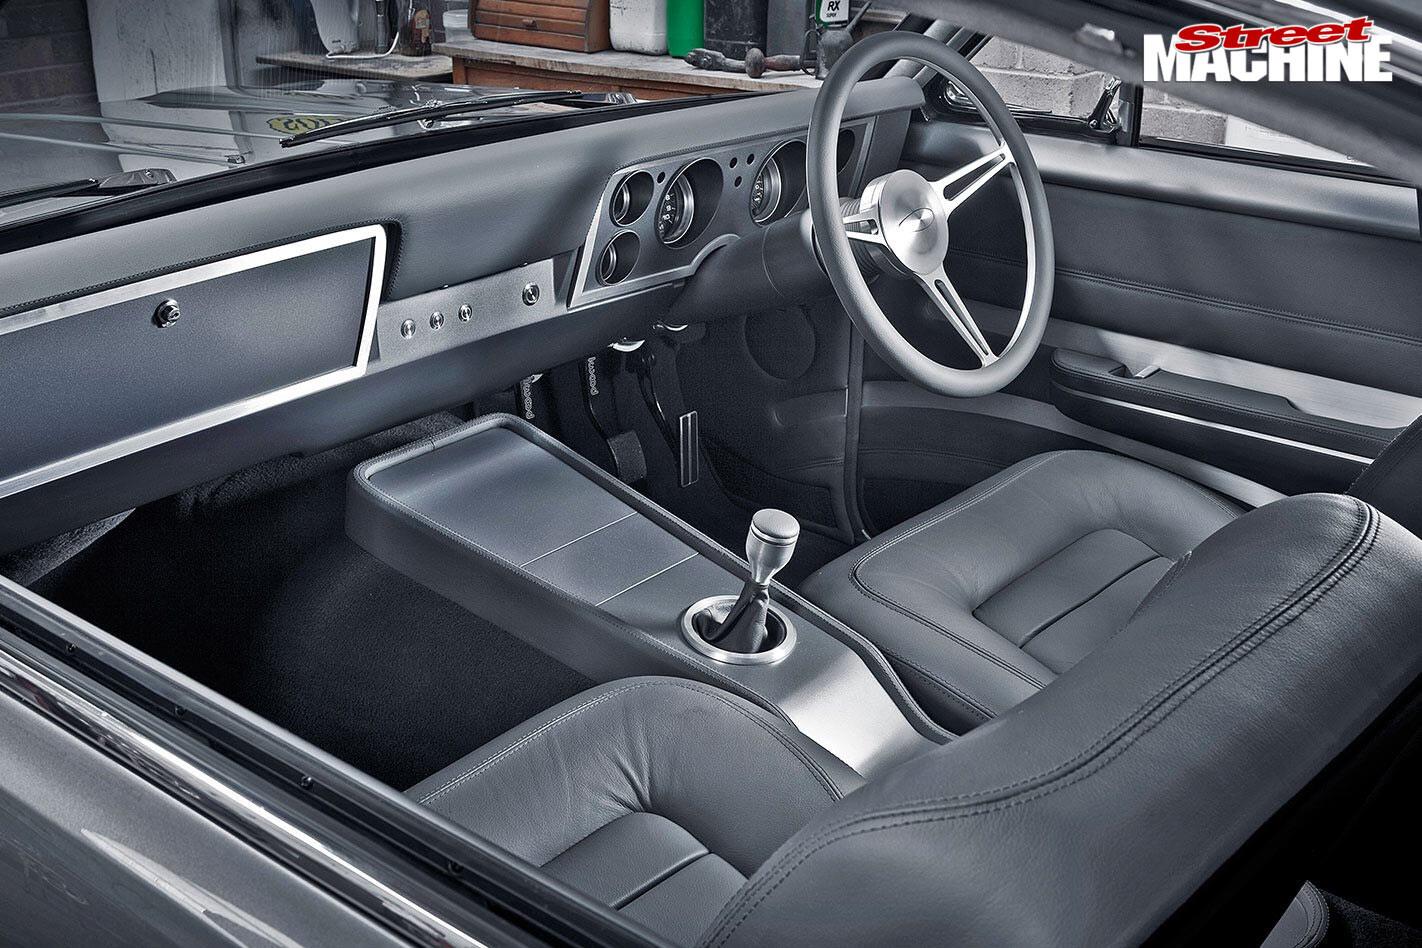 Holden HT Monaro interior front